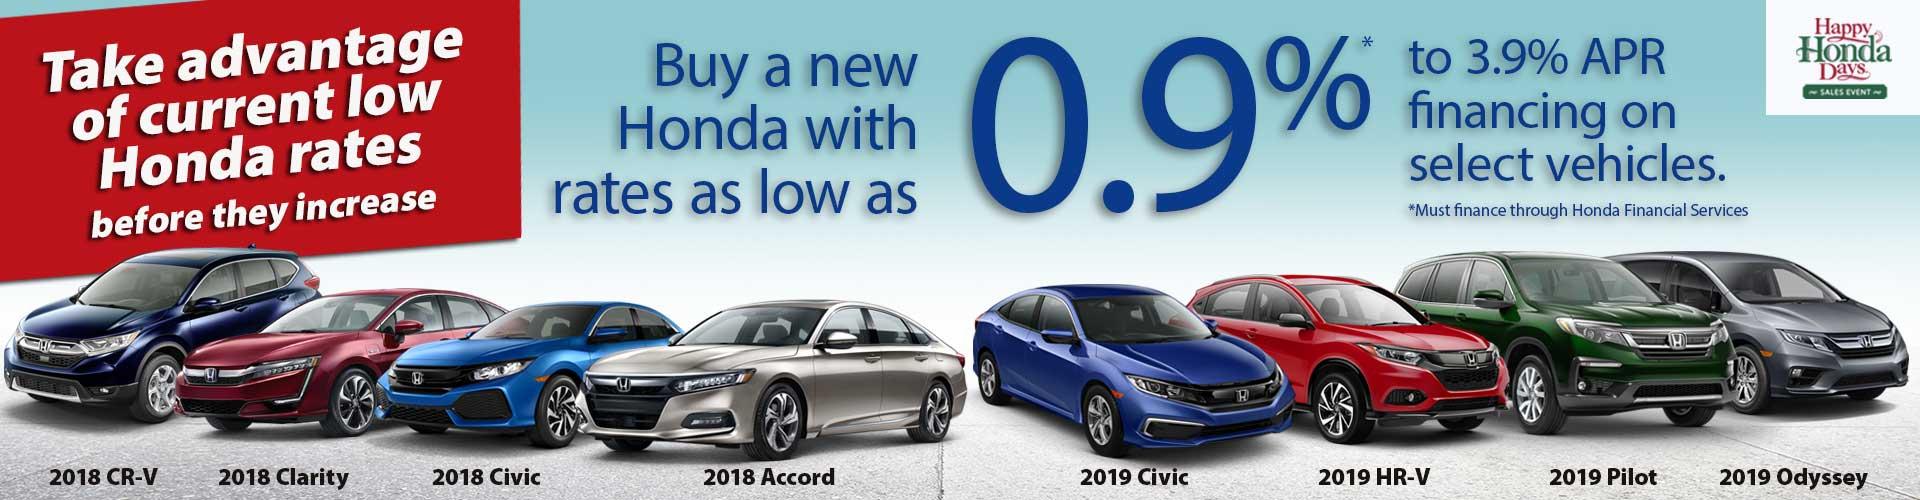 Honda Financing Rates >> Honda Finance Offers